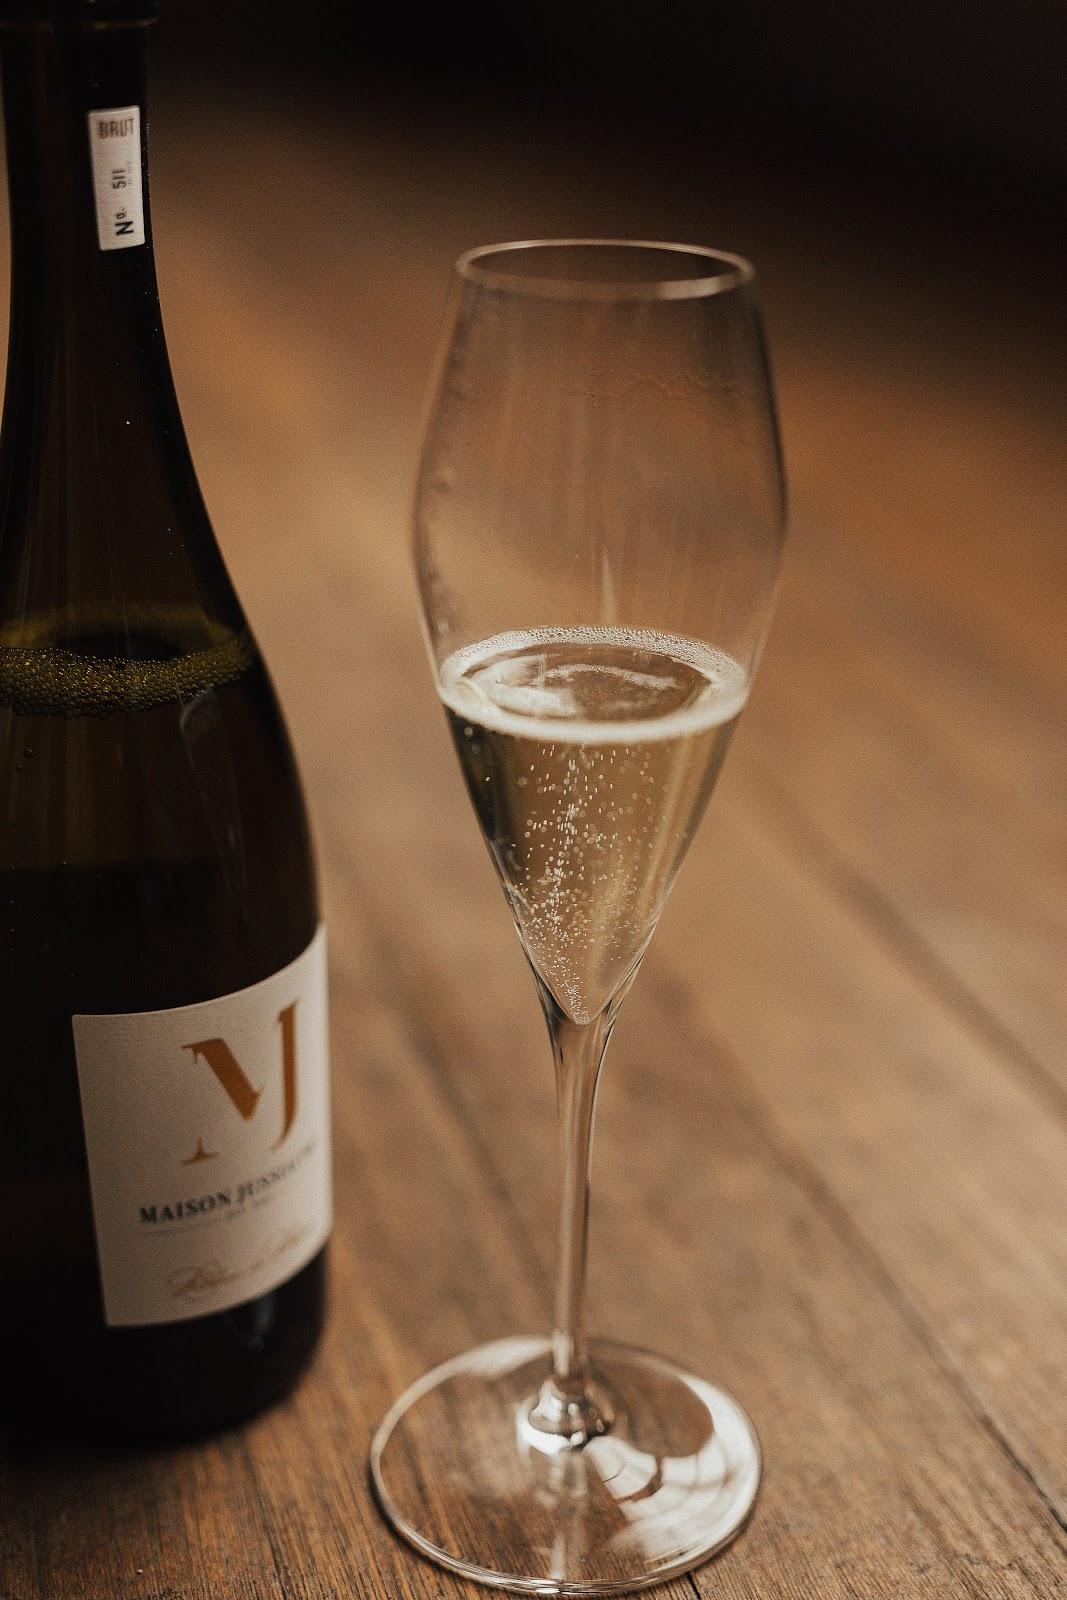 Maison Jussiaume Wines